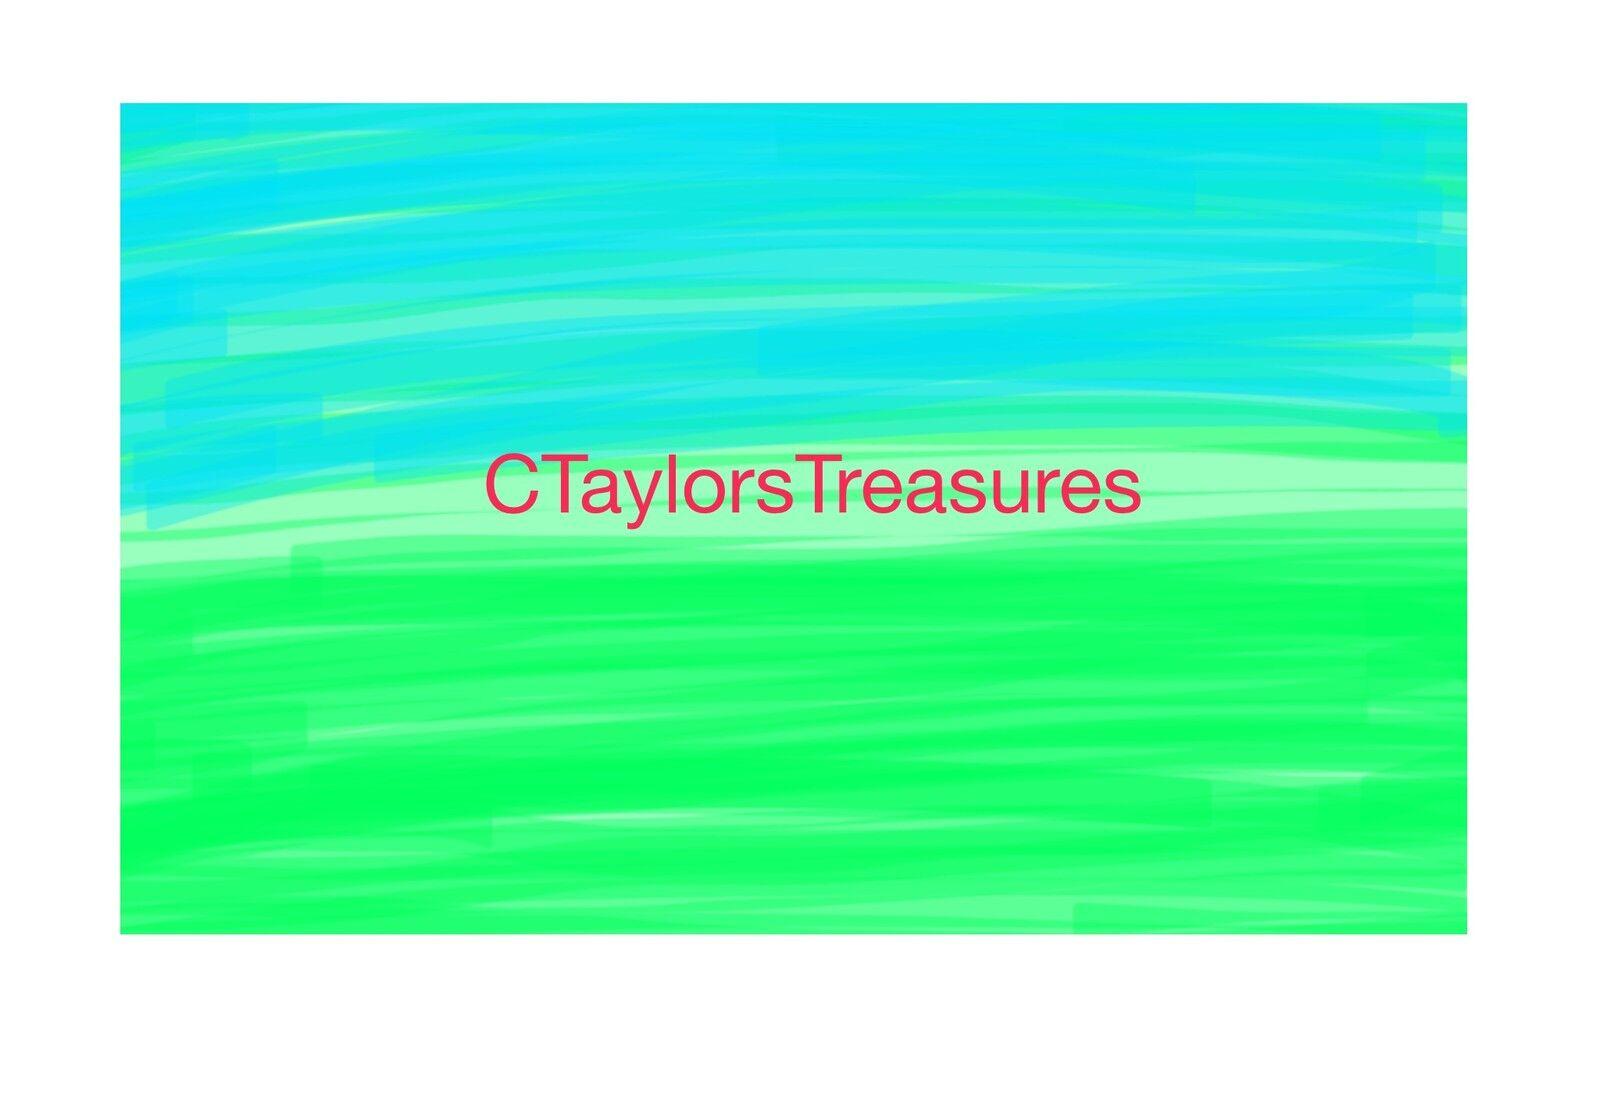 ctaylorstreasures